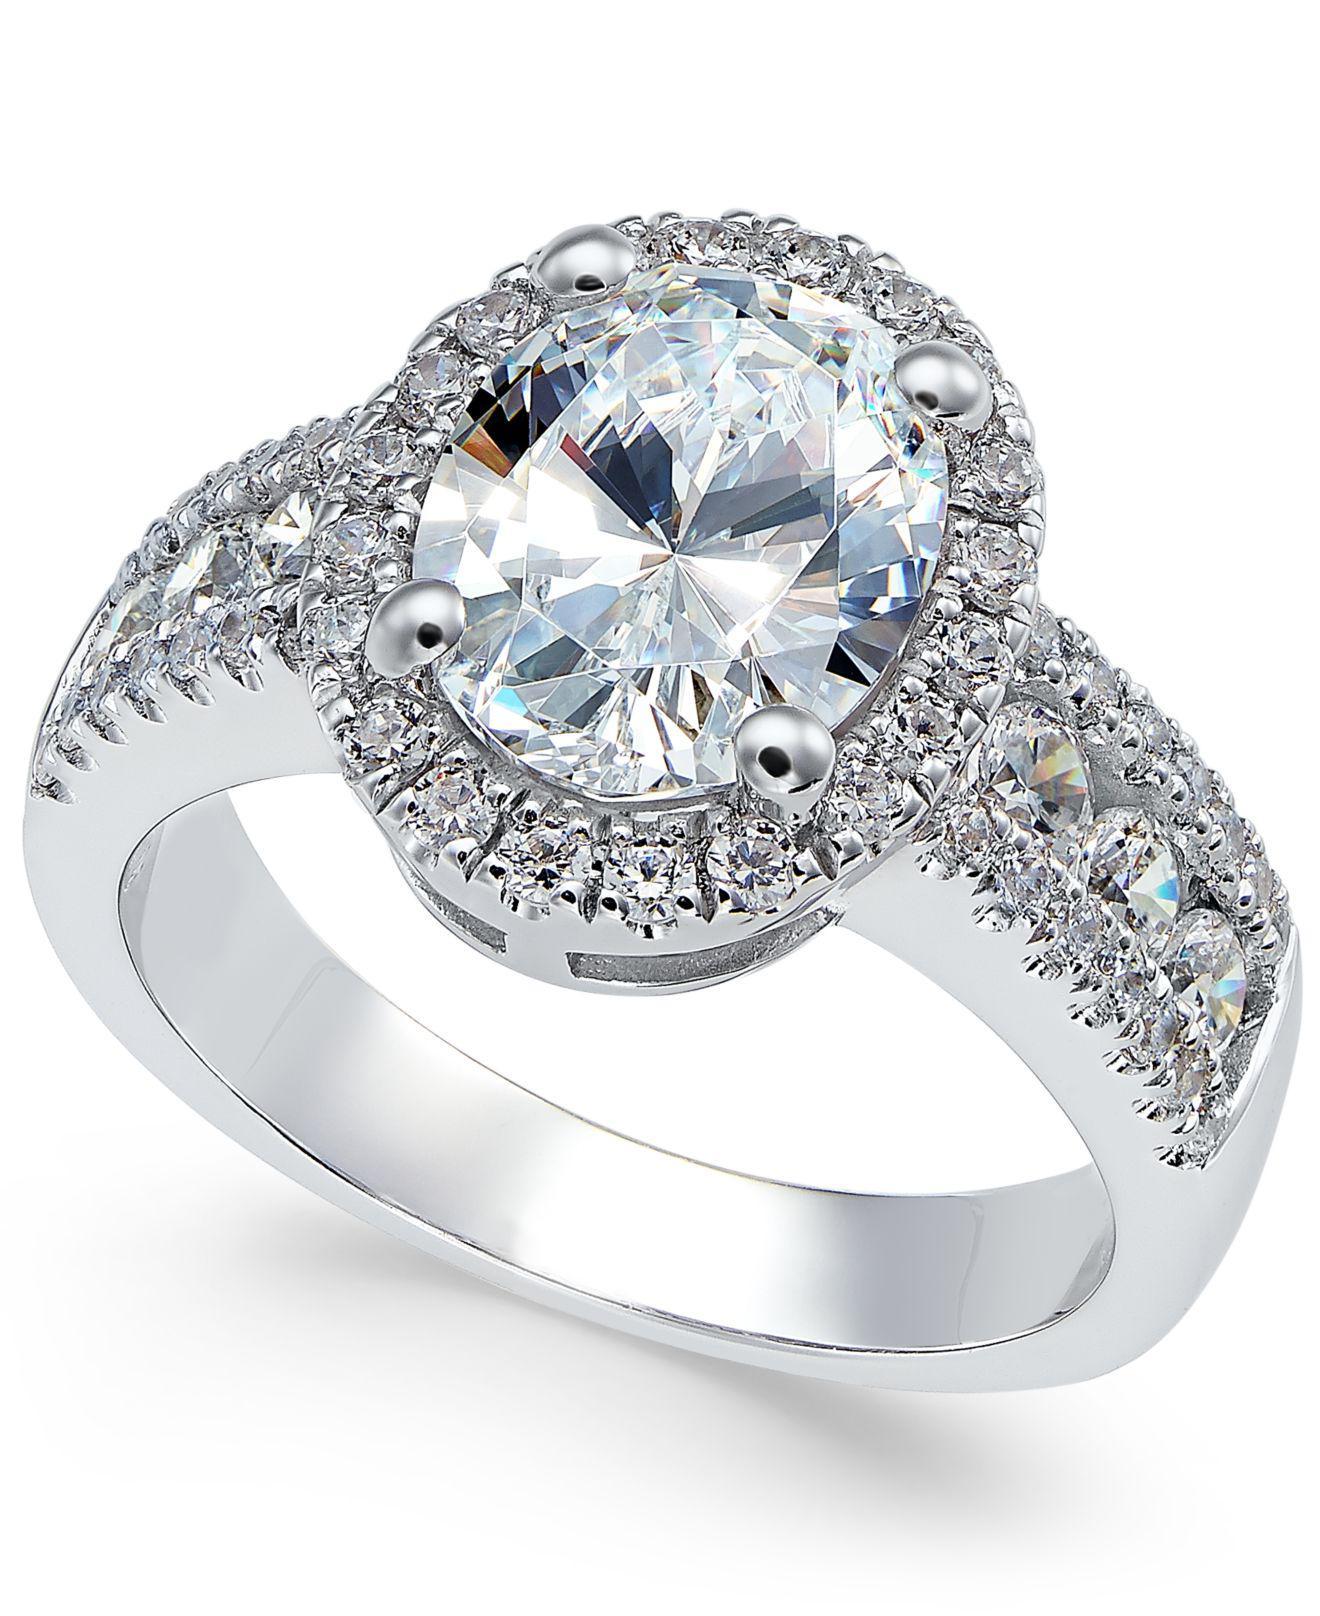 149da56904e2 Arabella. Women s Metallic Swarovski Zirconia Oval Halo Ring In Sterling  Silver